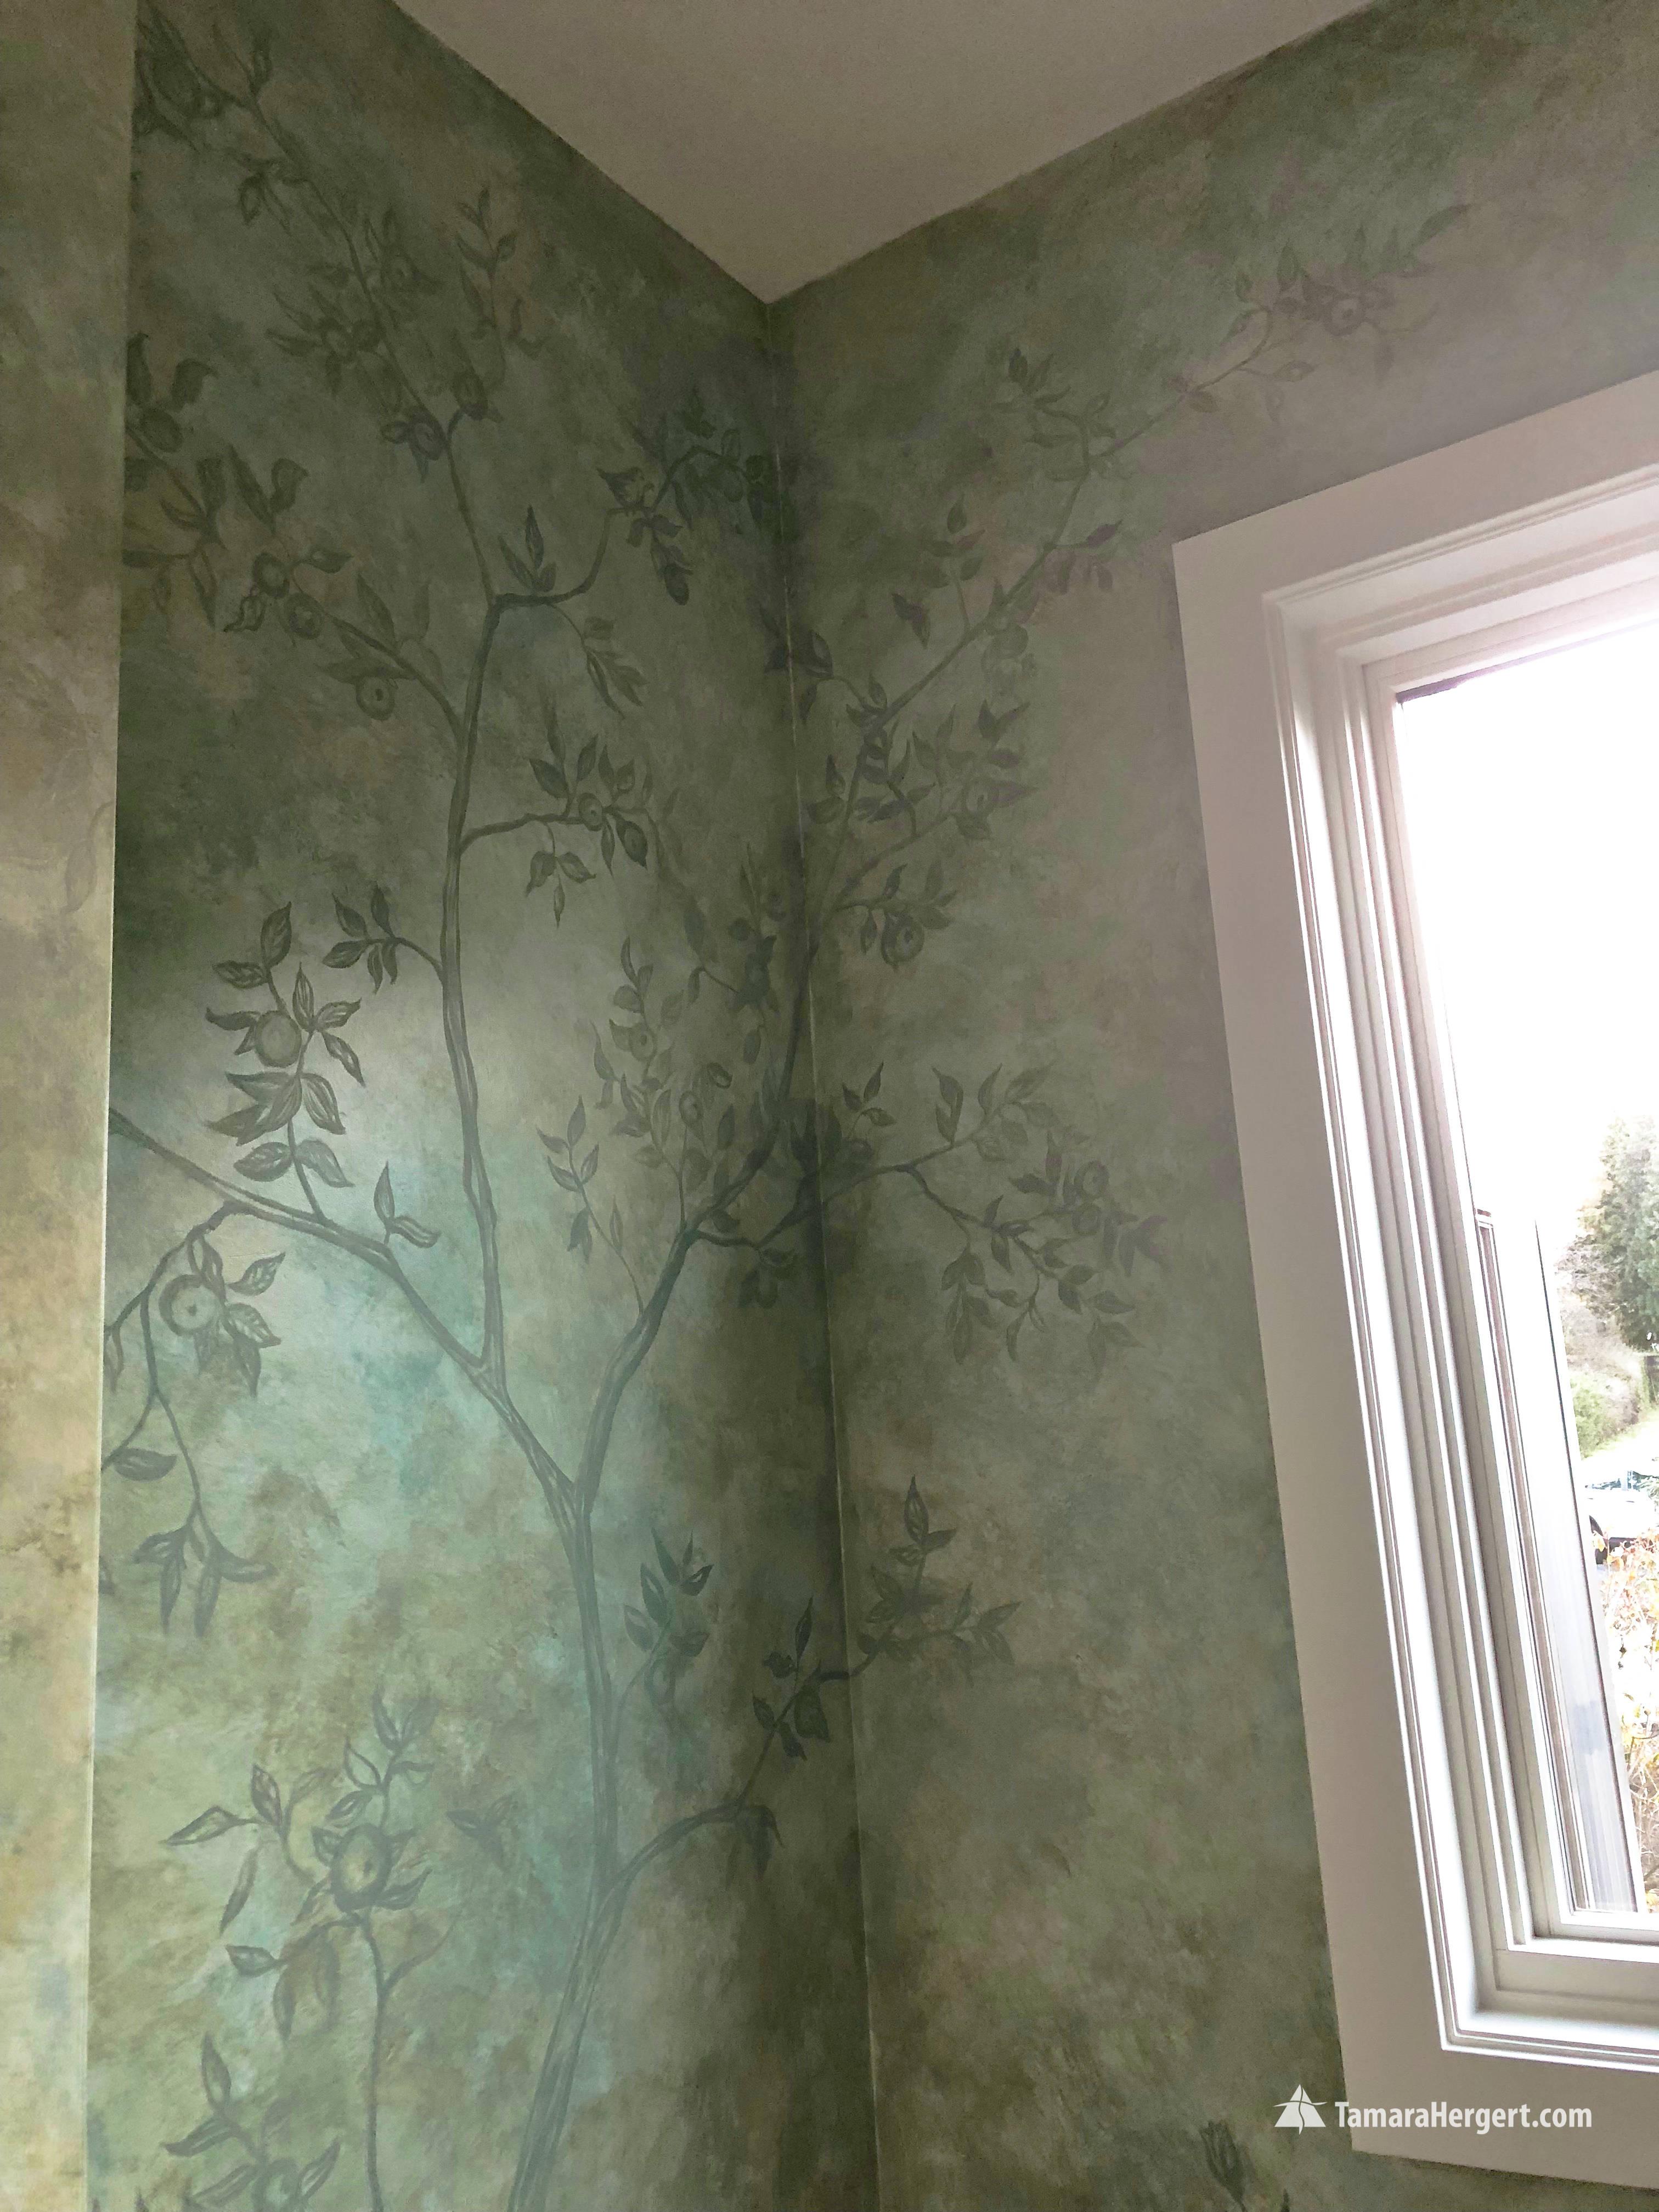 Subtle tones apple tree mural by Tamara